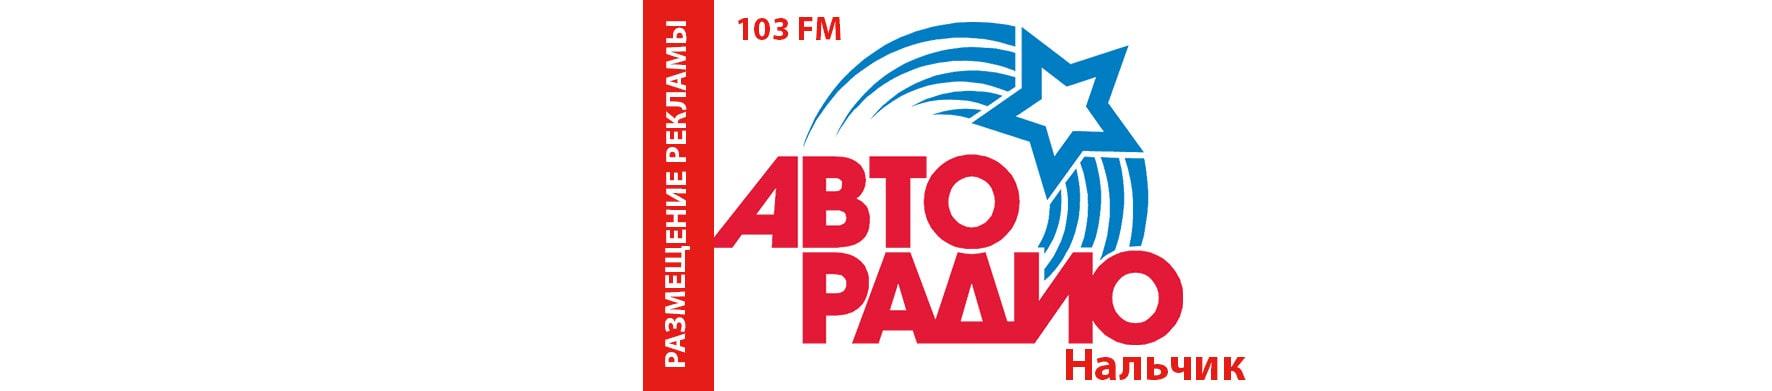 Реклама на радио в Кабардино-Балкарии Авторадио